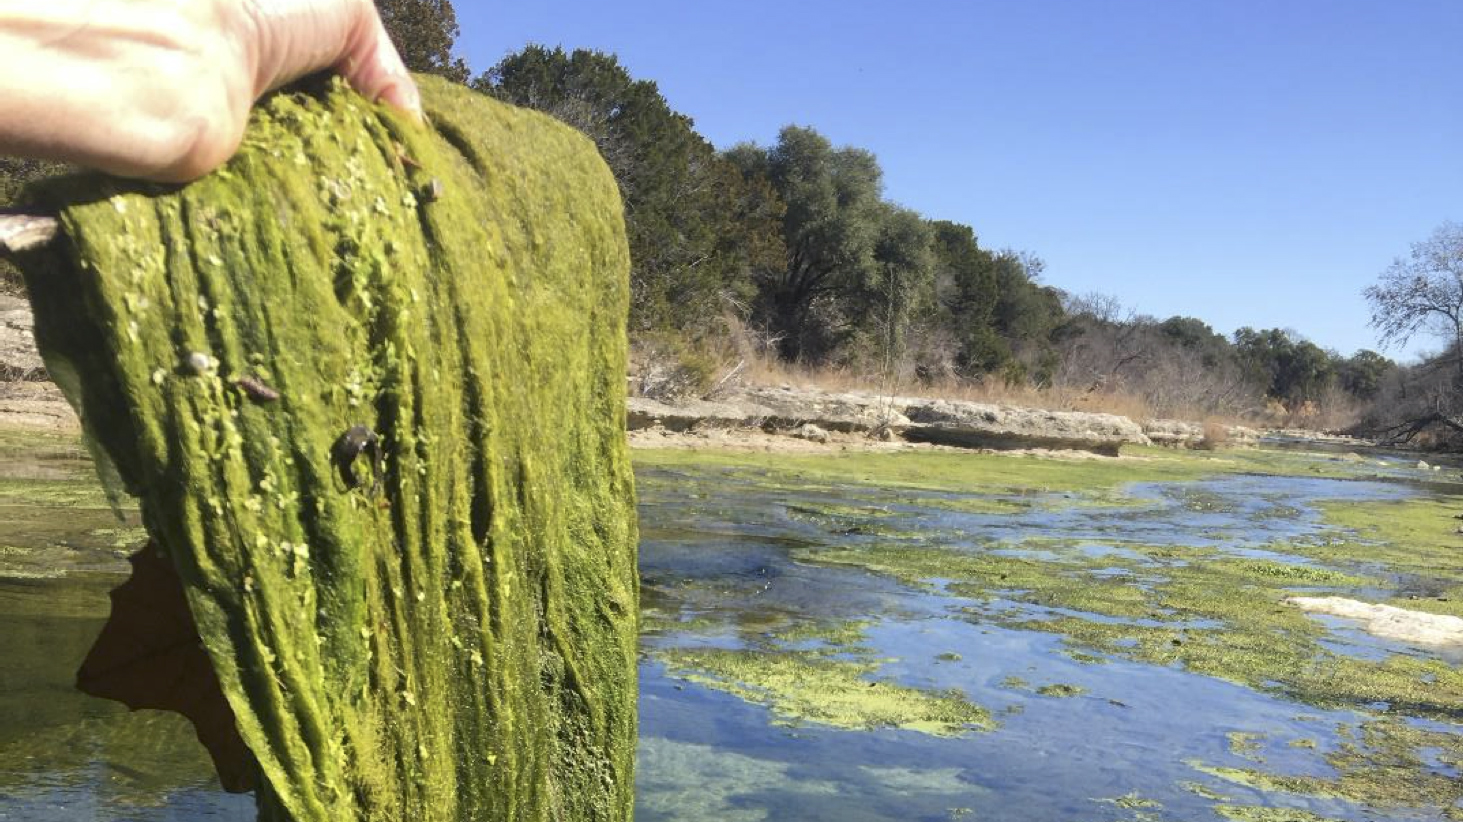 Algae bloom in South San Gabriel River downstream of the Liberty Hill wastewater plant (Courtesy Save Barton Creek Association)